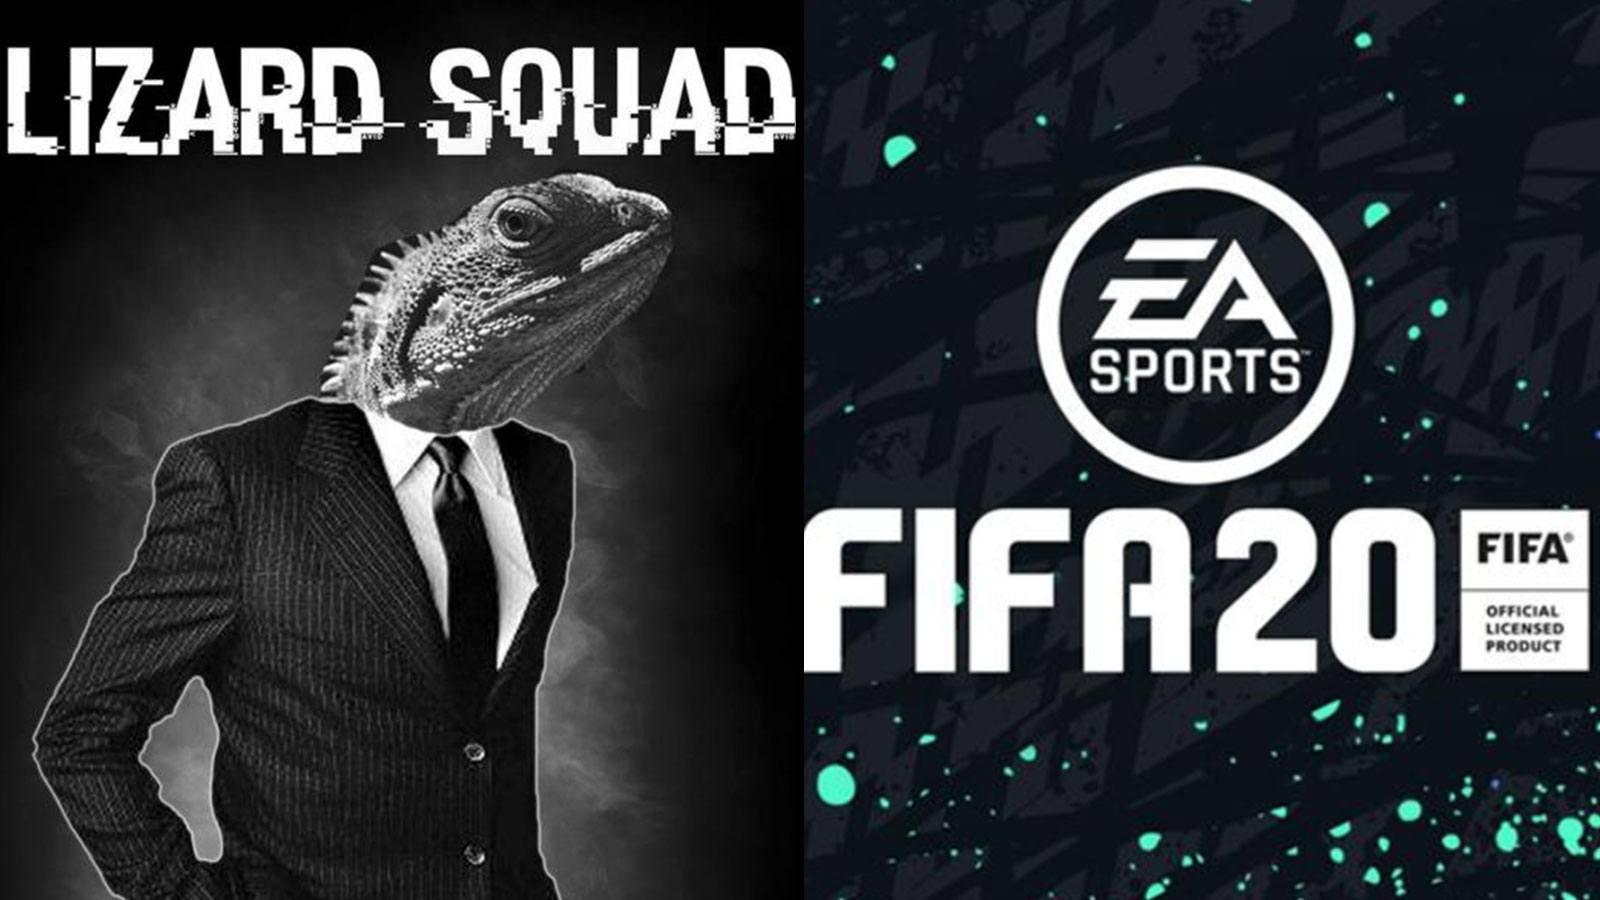 Lizard Squad | Electronic Arts